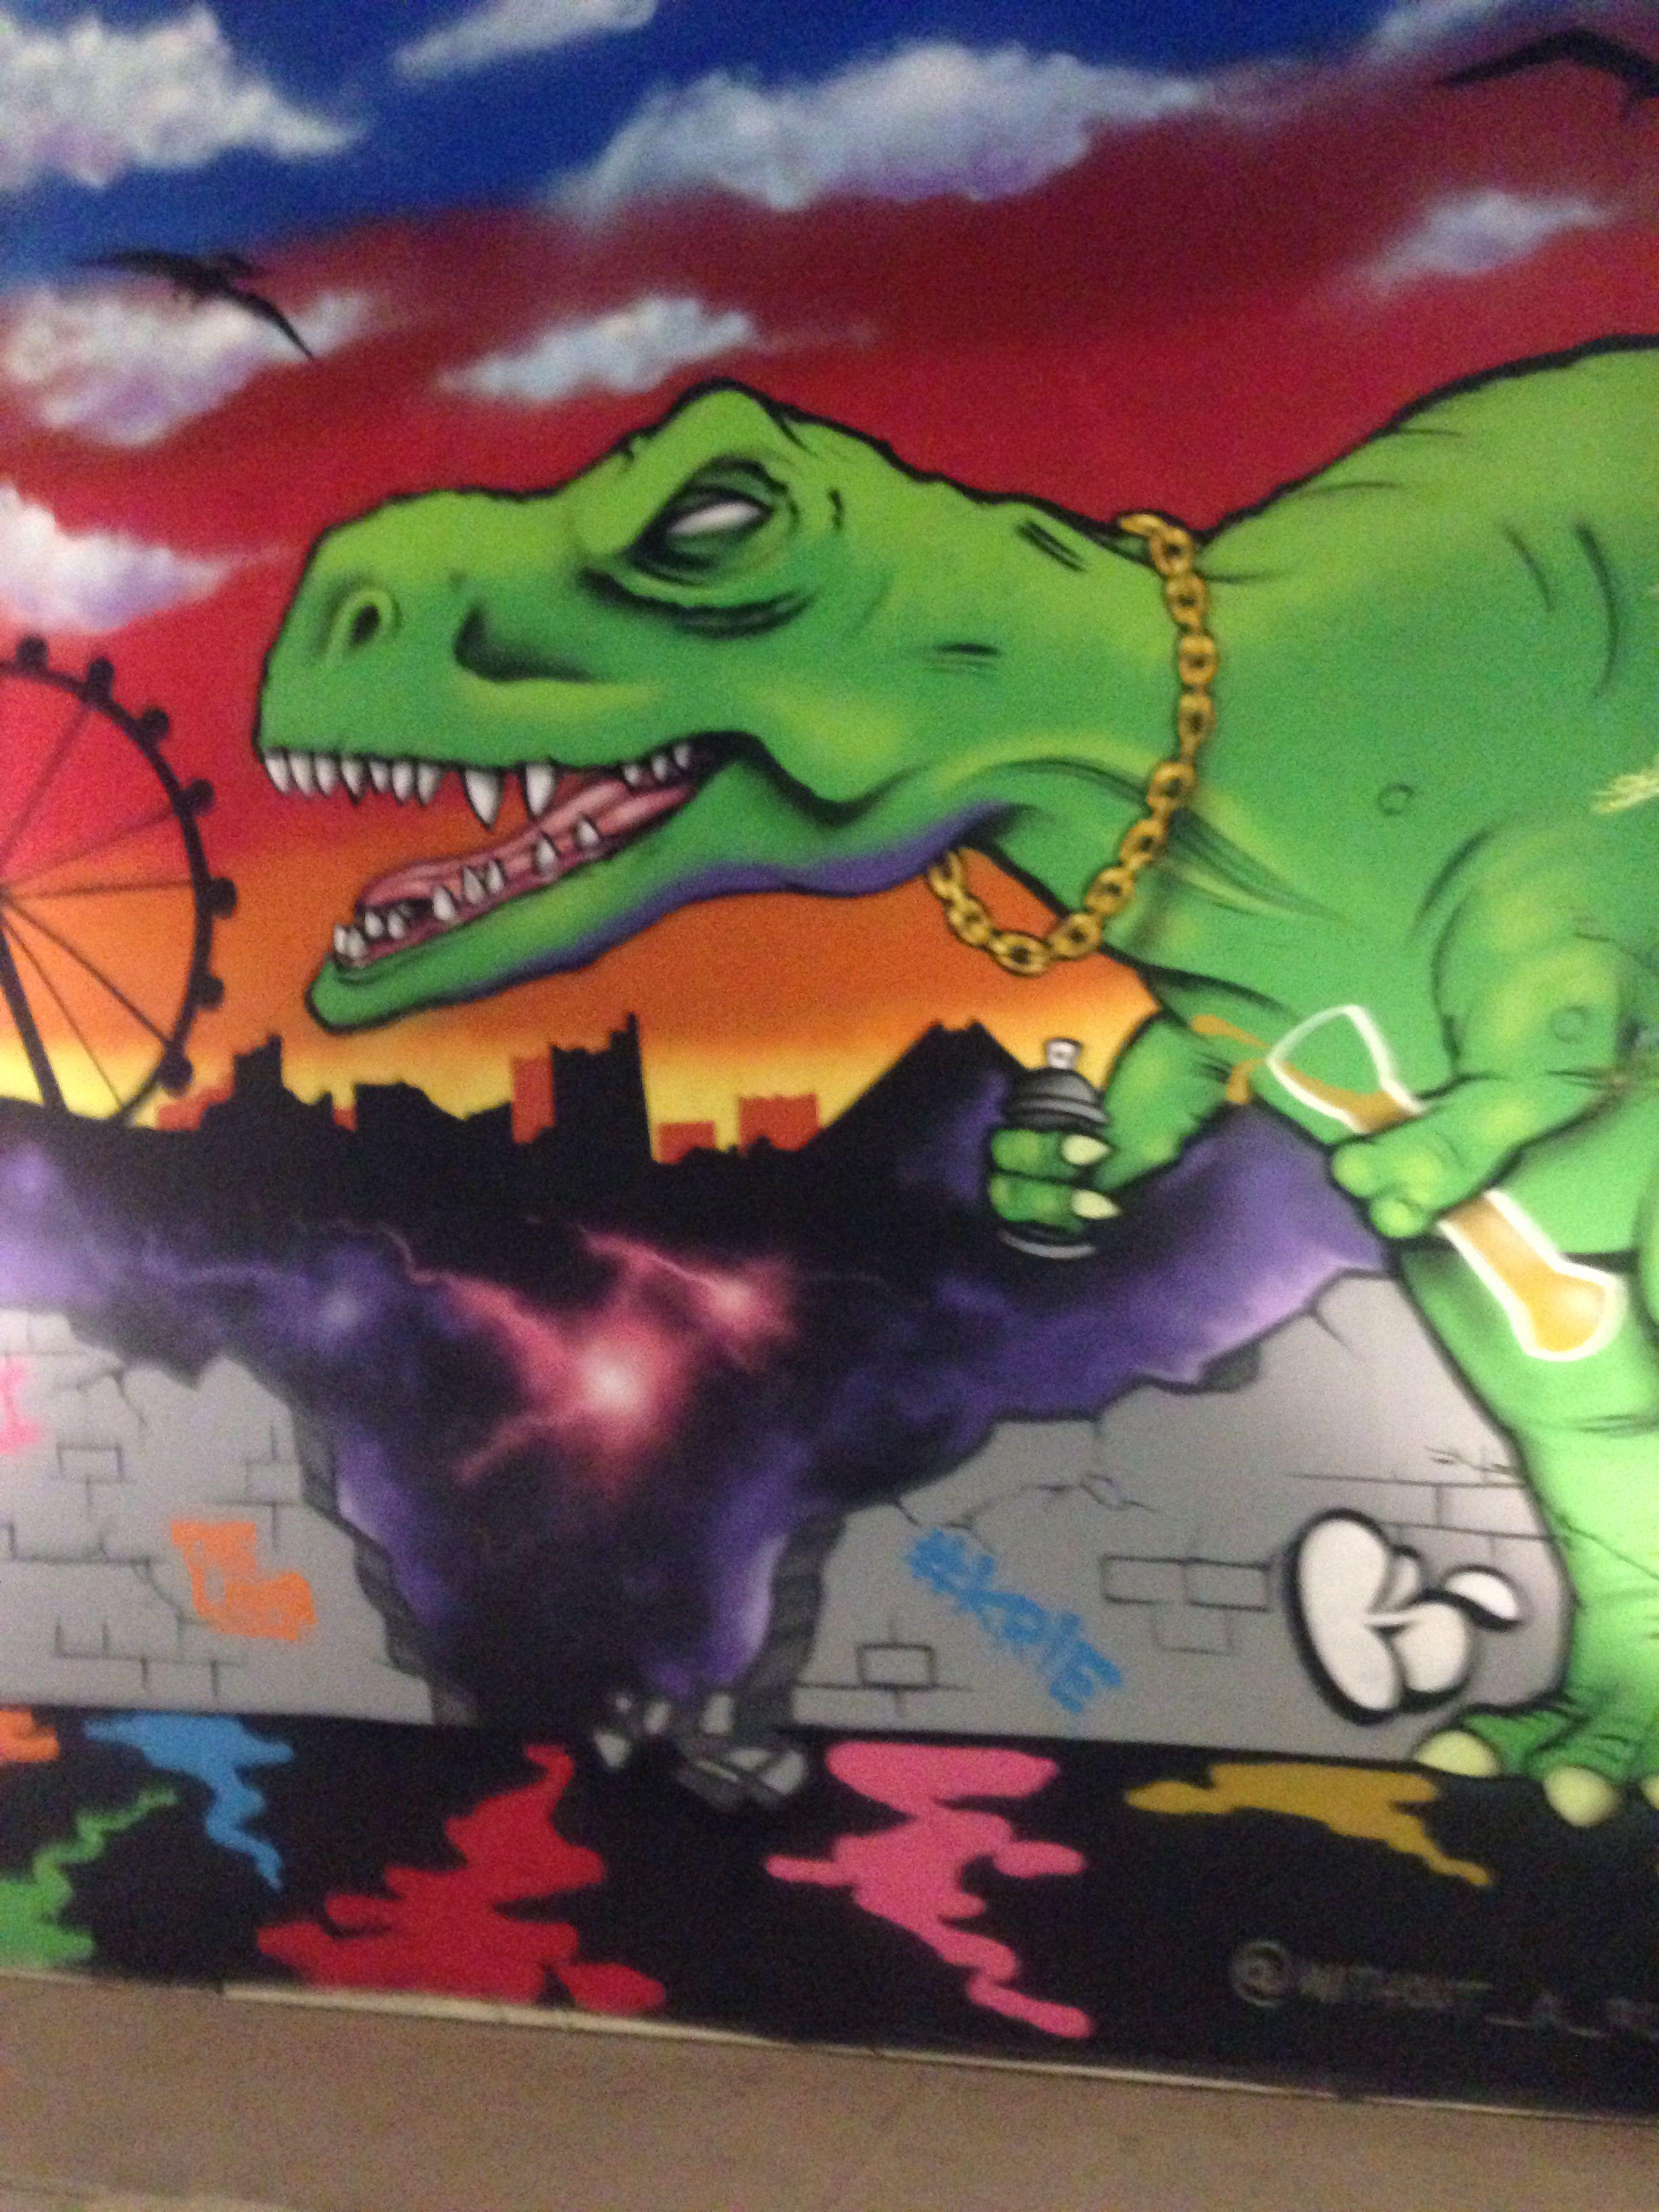 #streetart #lasvegas (With images)   Street art, Las vegas ...